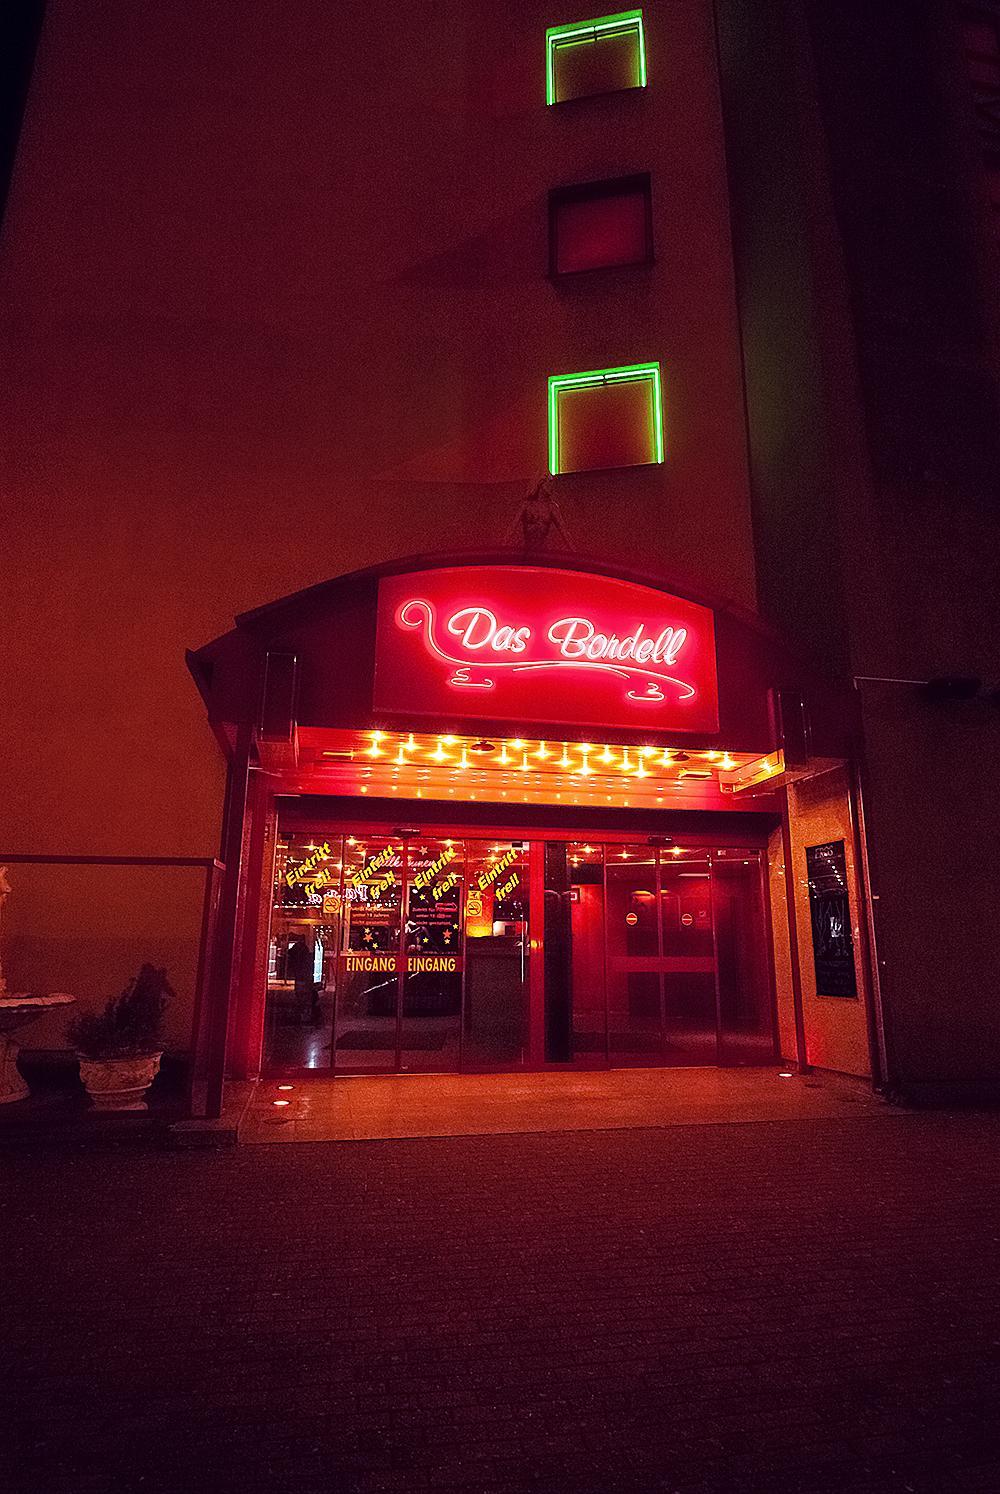 Bordell/Laufhaus - Das Bordell Köln aus Köln | Chixxi.com